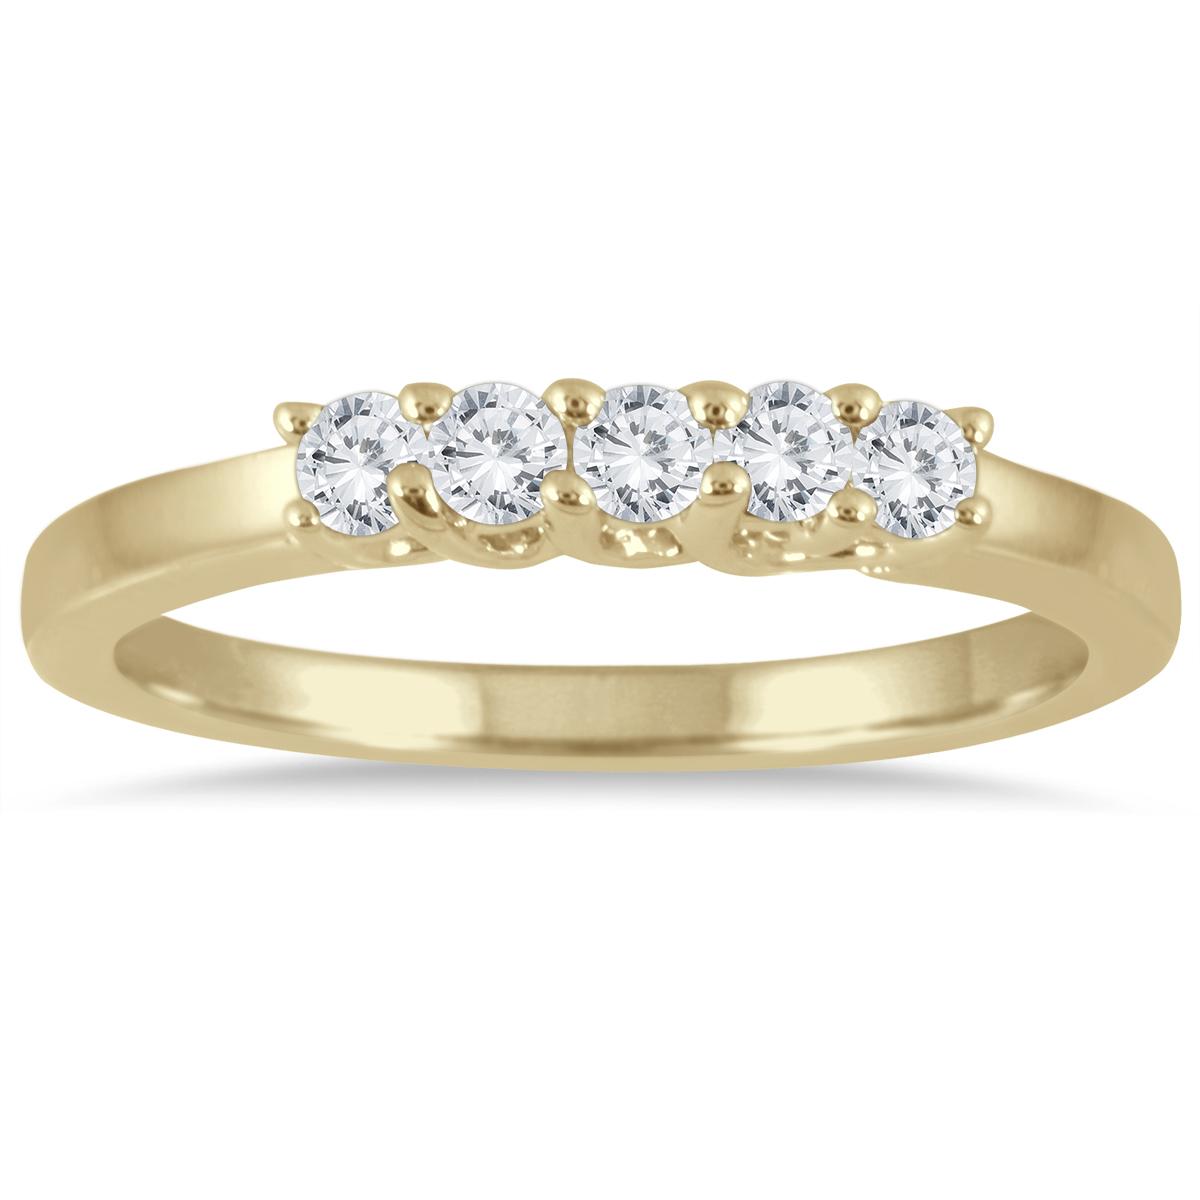 1/4 Carat TW Five Stone Diamond Wedding Band in 14K Yellow Gold